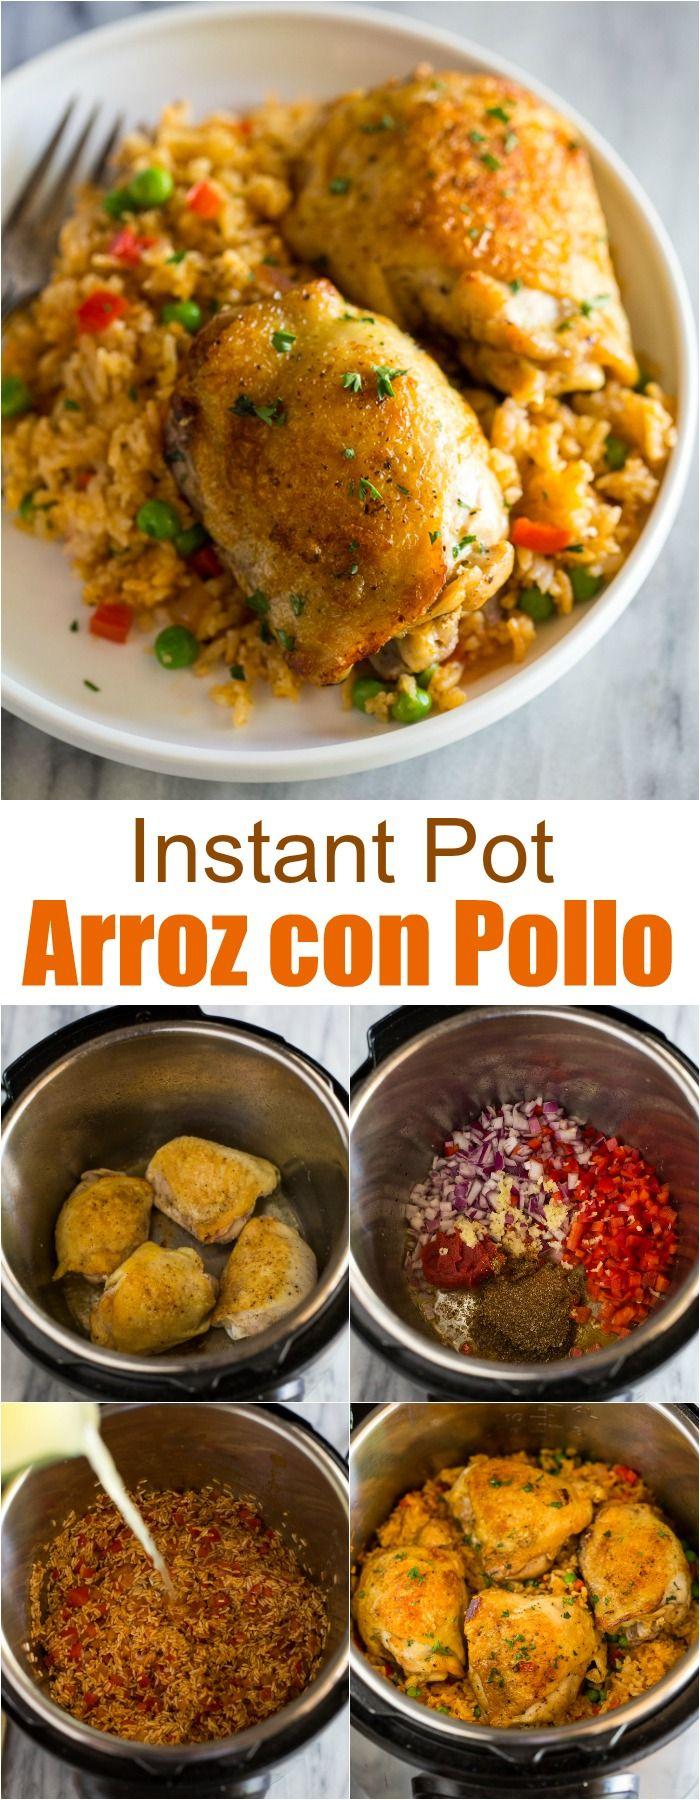 Instant Pot Arroz con Pollo #instantpotrecipes